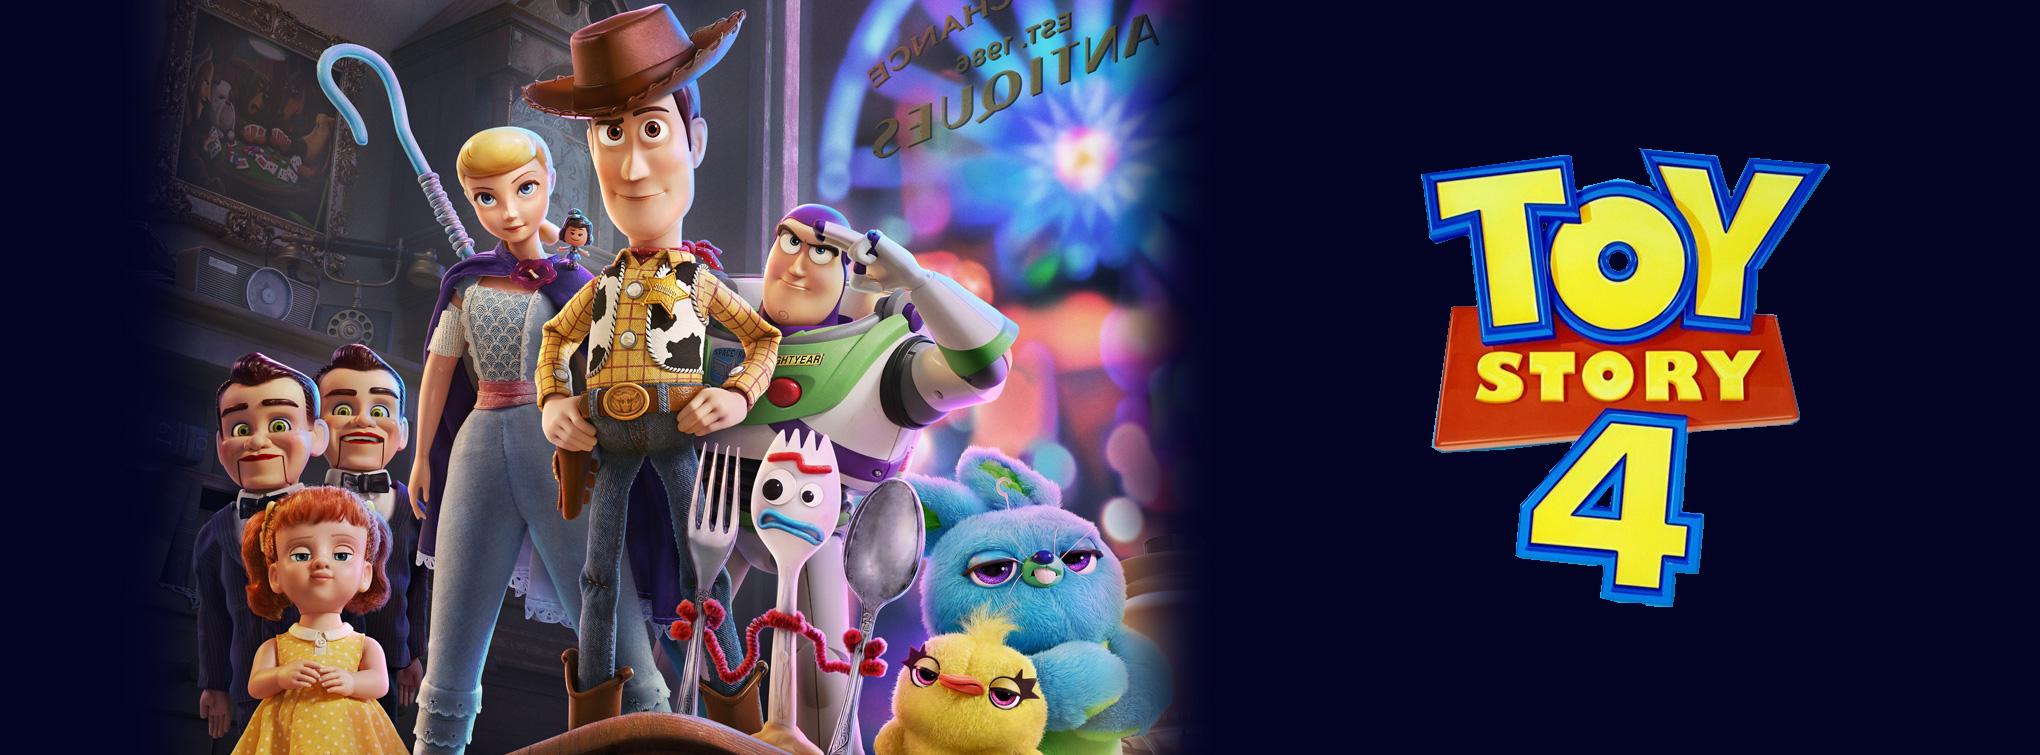 Slider image for Toy Story 4